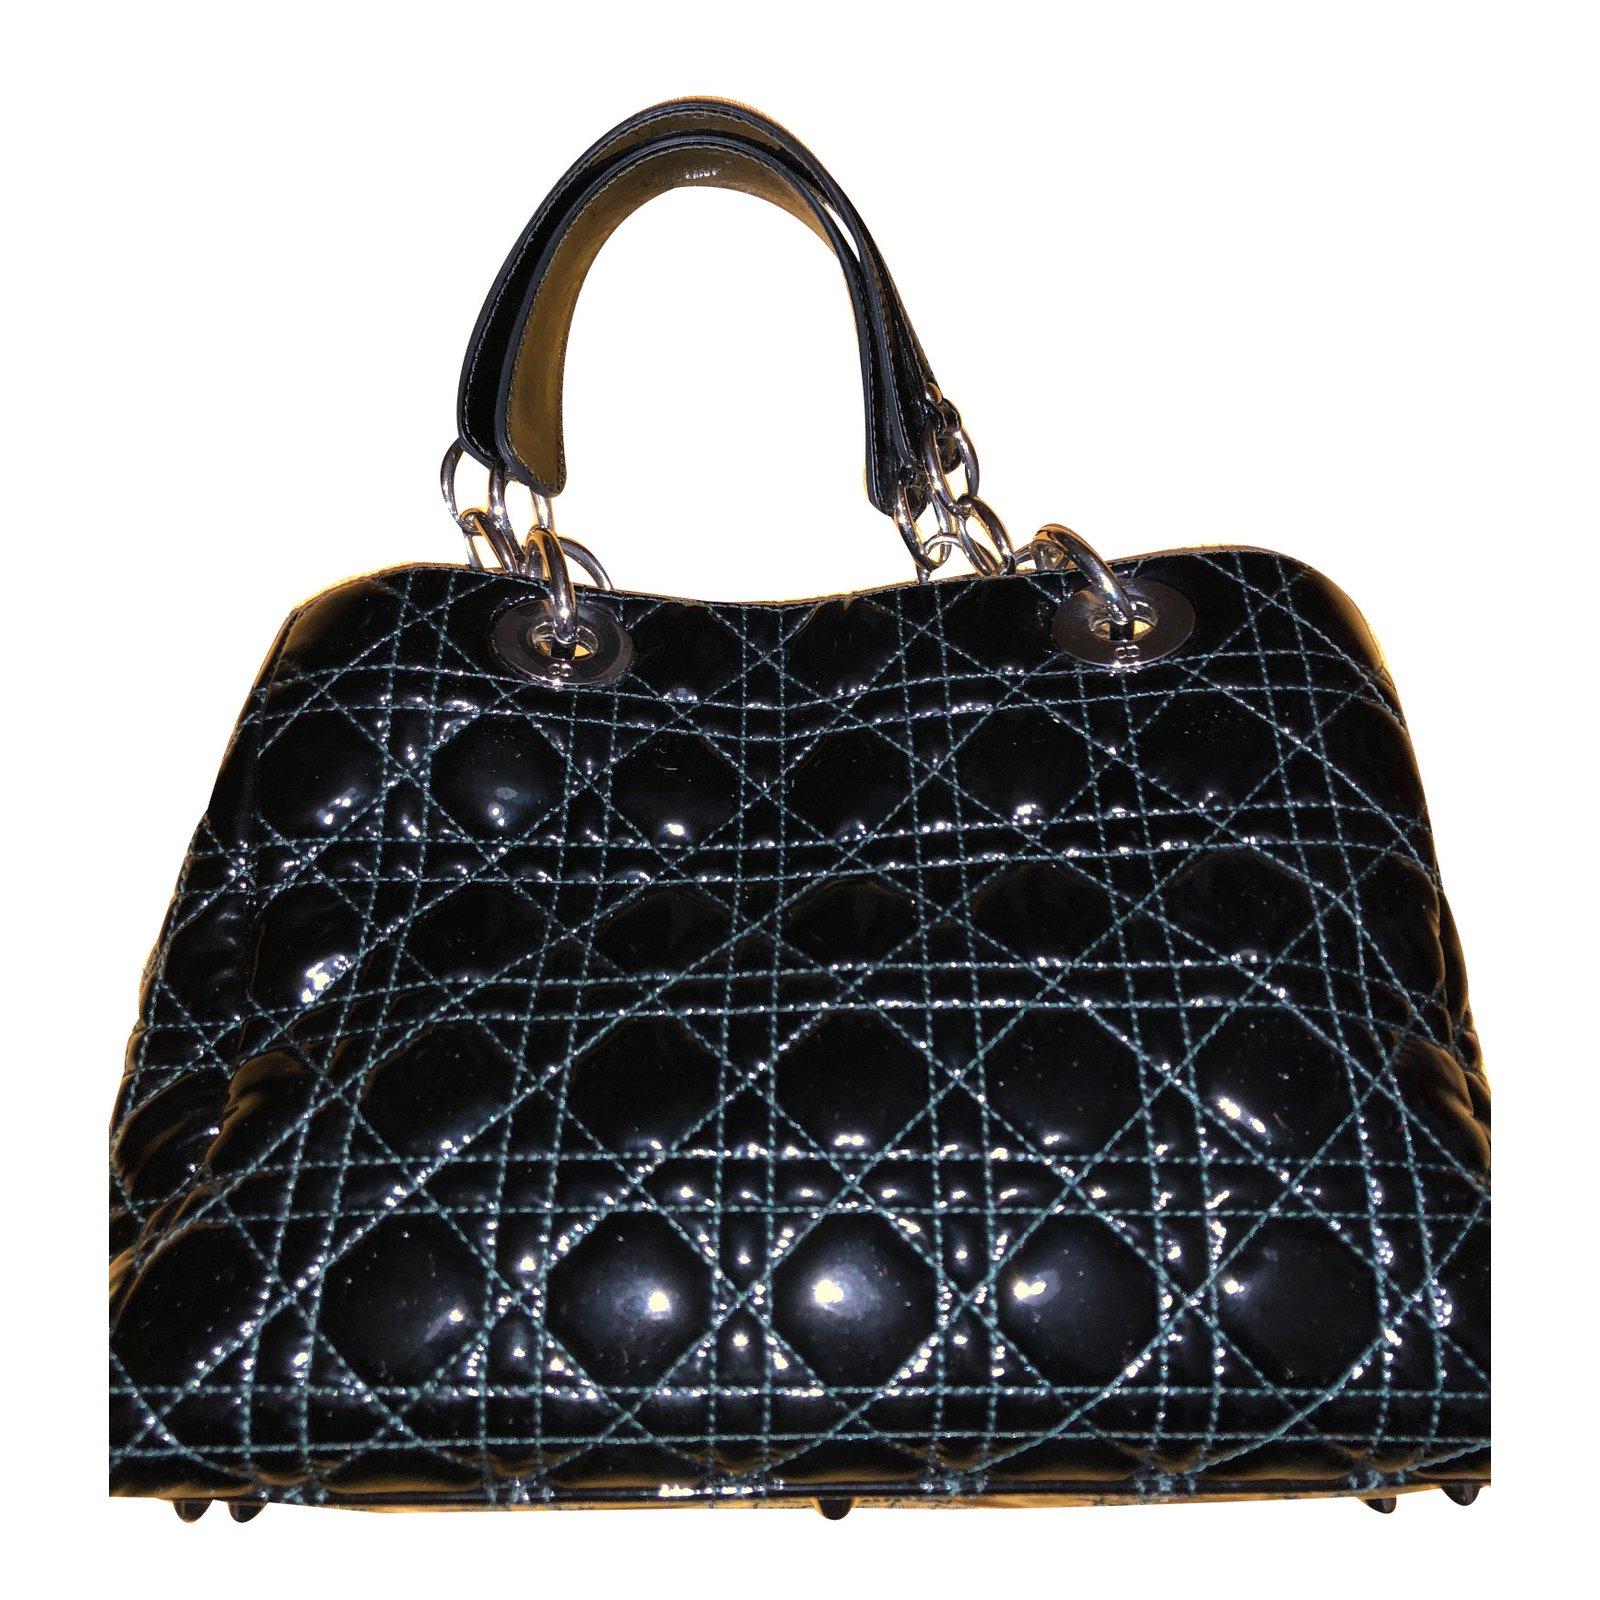 Dior Soft Handbags Patent Leather Black Ref 62110